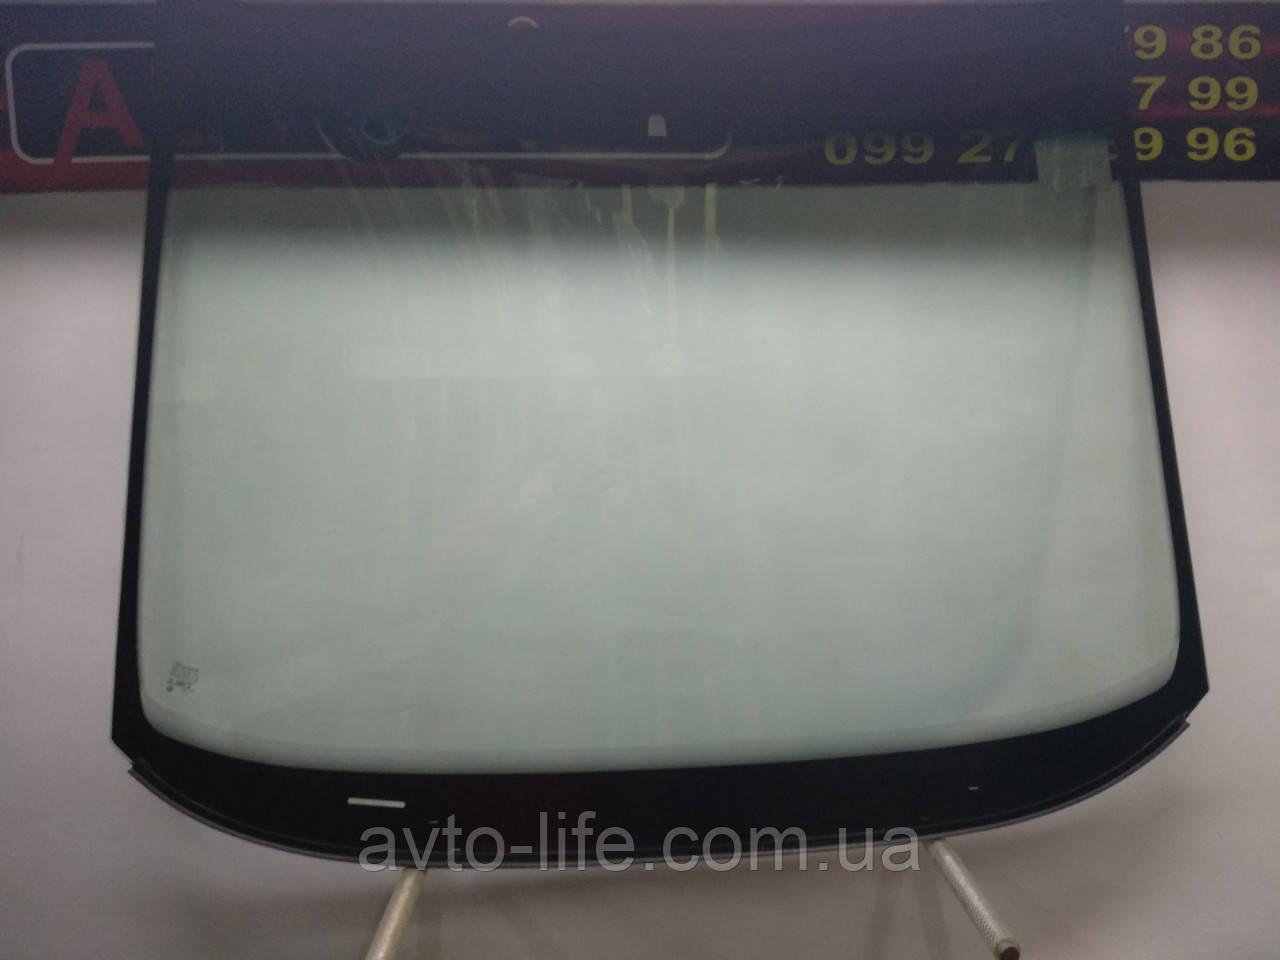 Лобовое стеклоFord Galaxy (2006-2015) | автостекло Форд Галакси | лобове скло Форд Гелекси Замена 450 грн